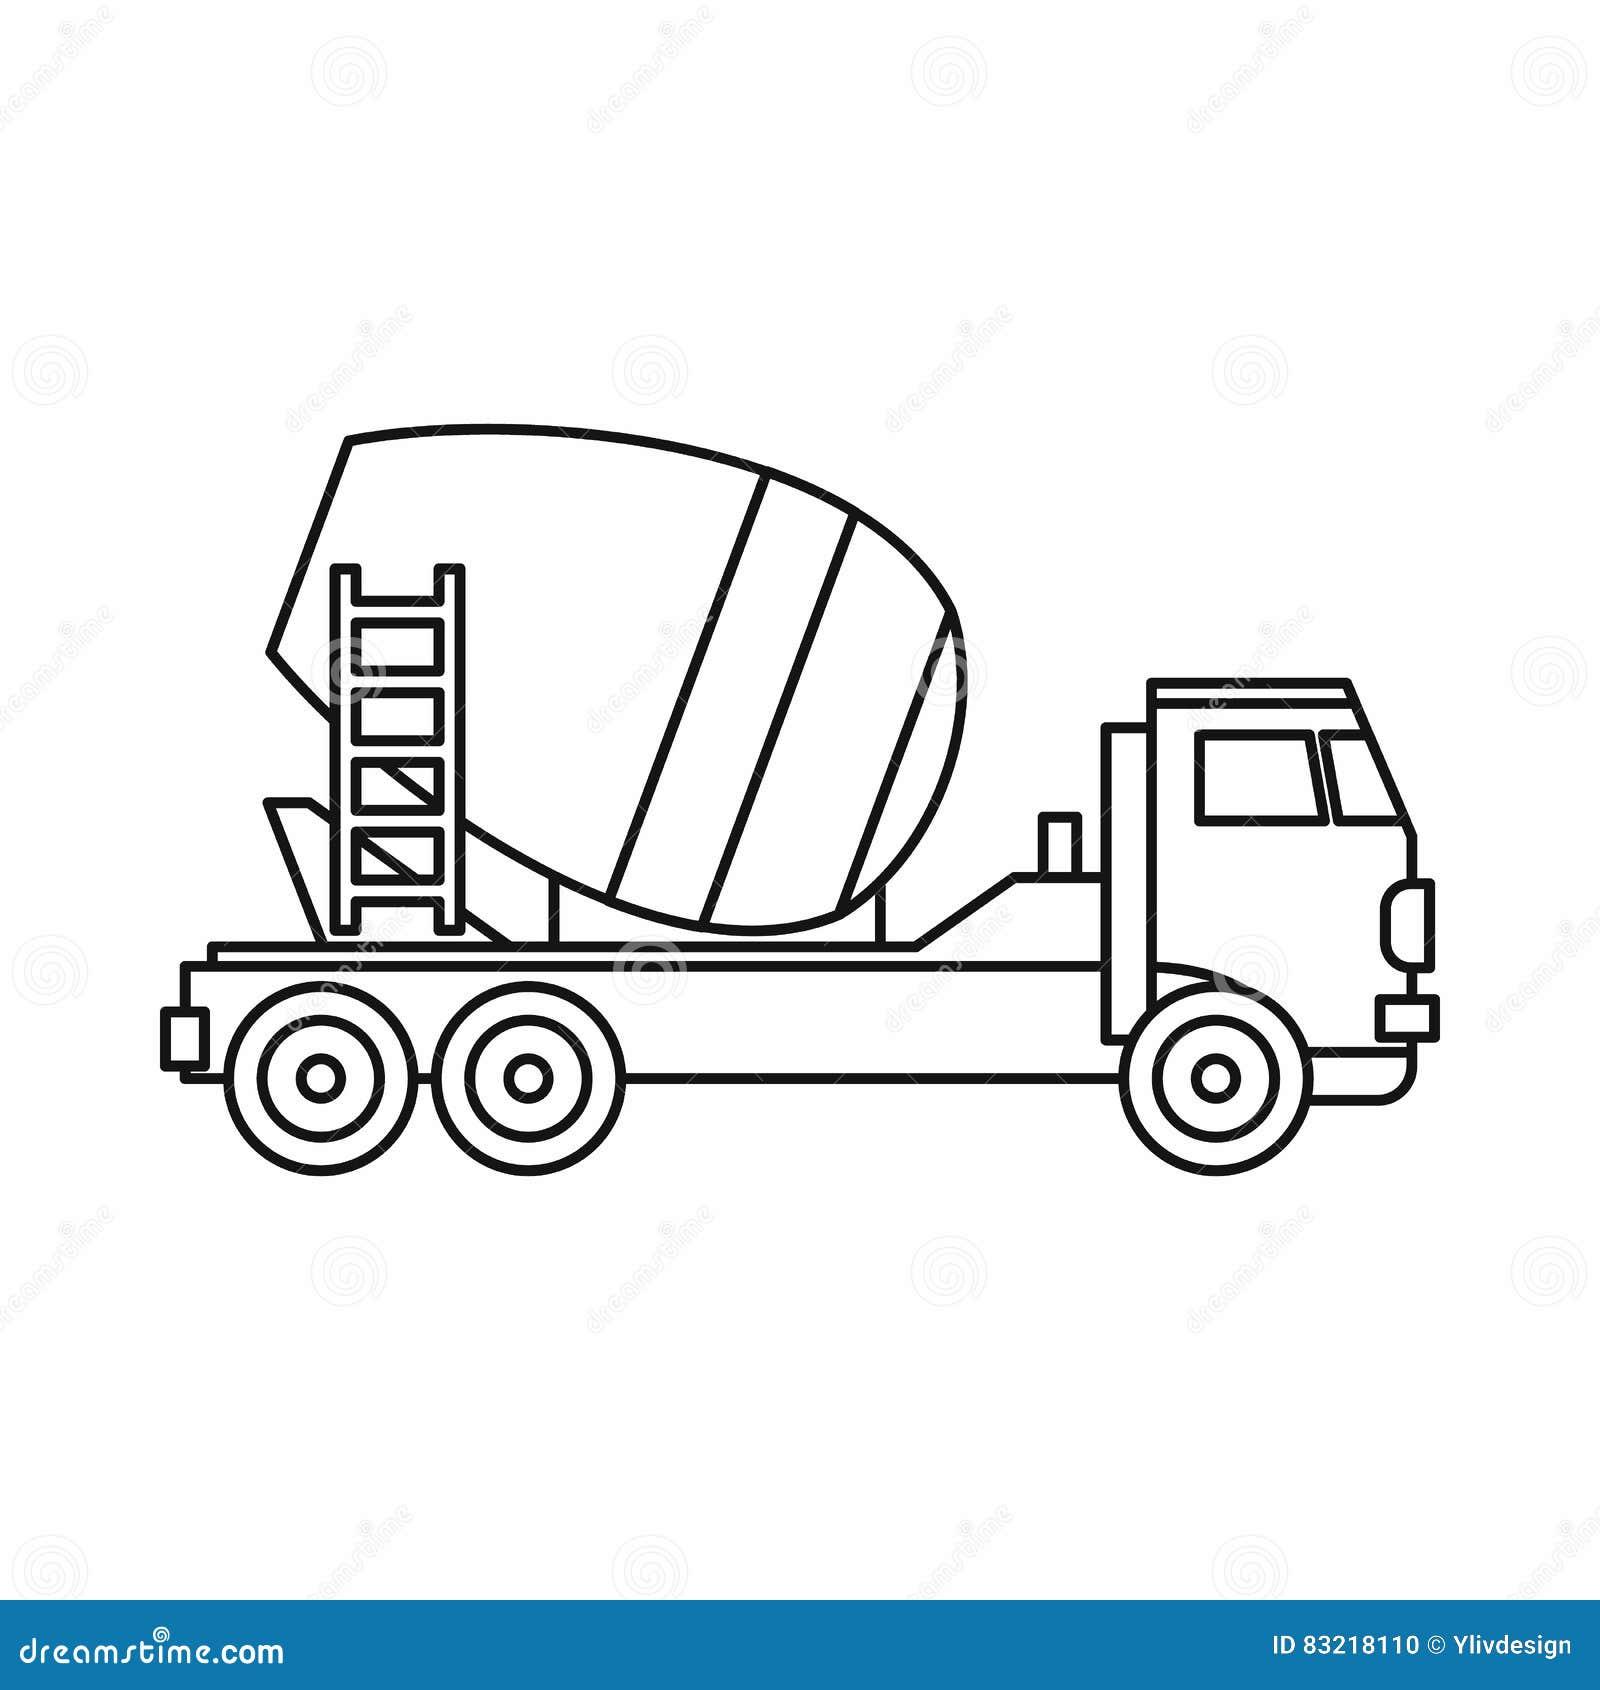 Electric Mixer Outline ~ Concrete mixer truck icon outline style stock vector